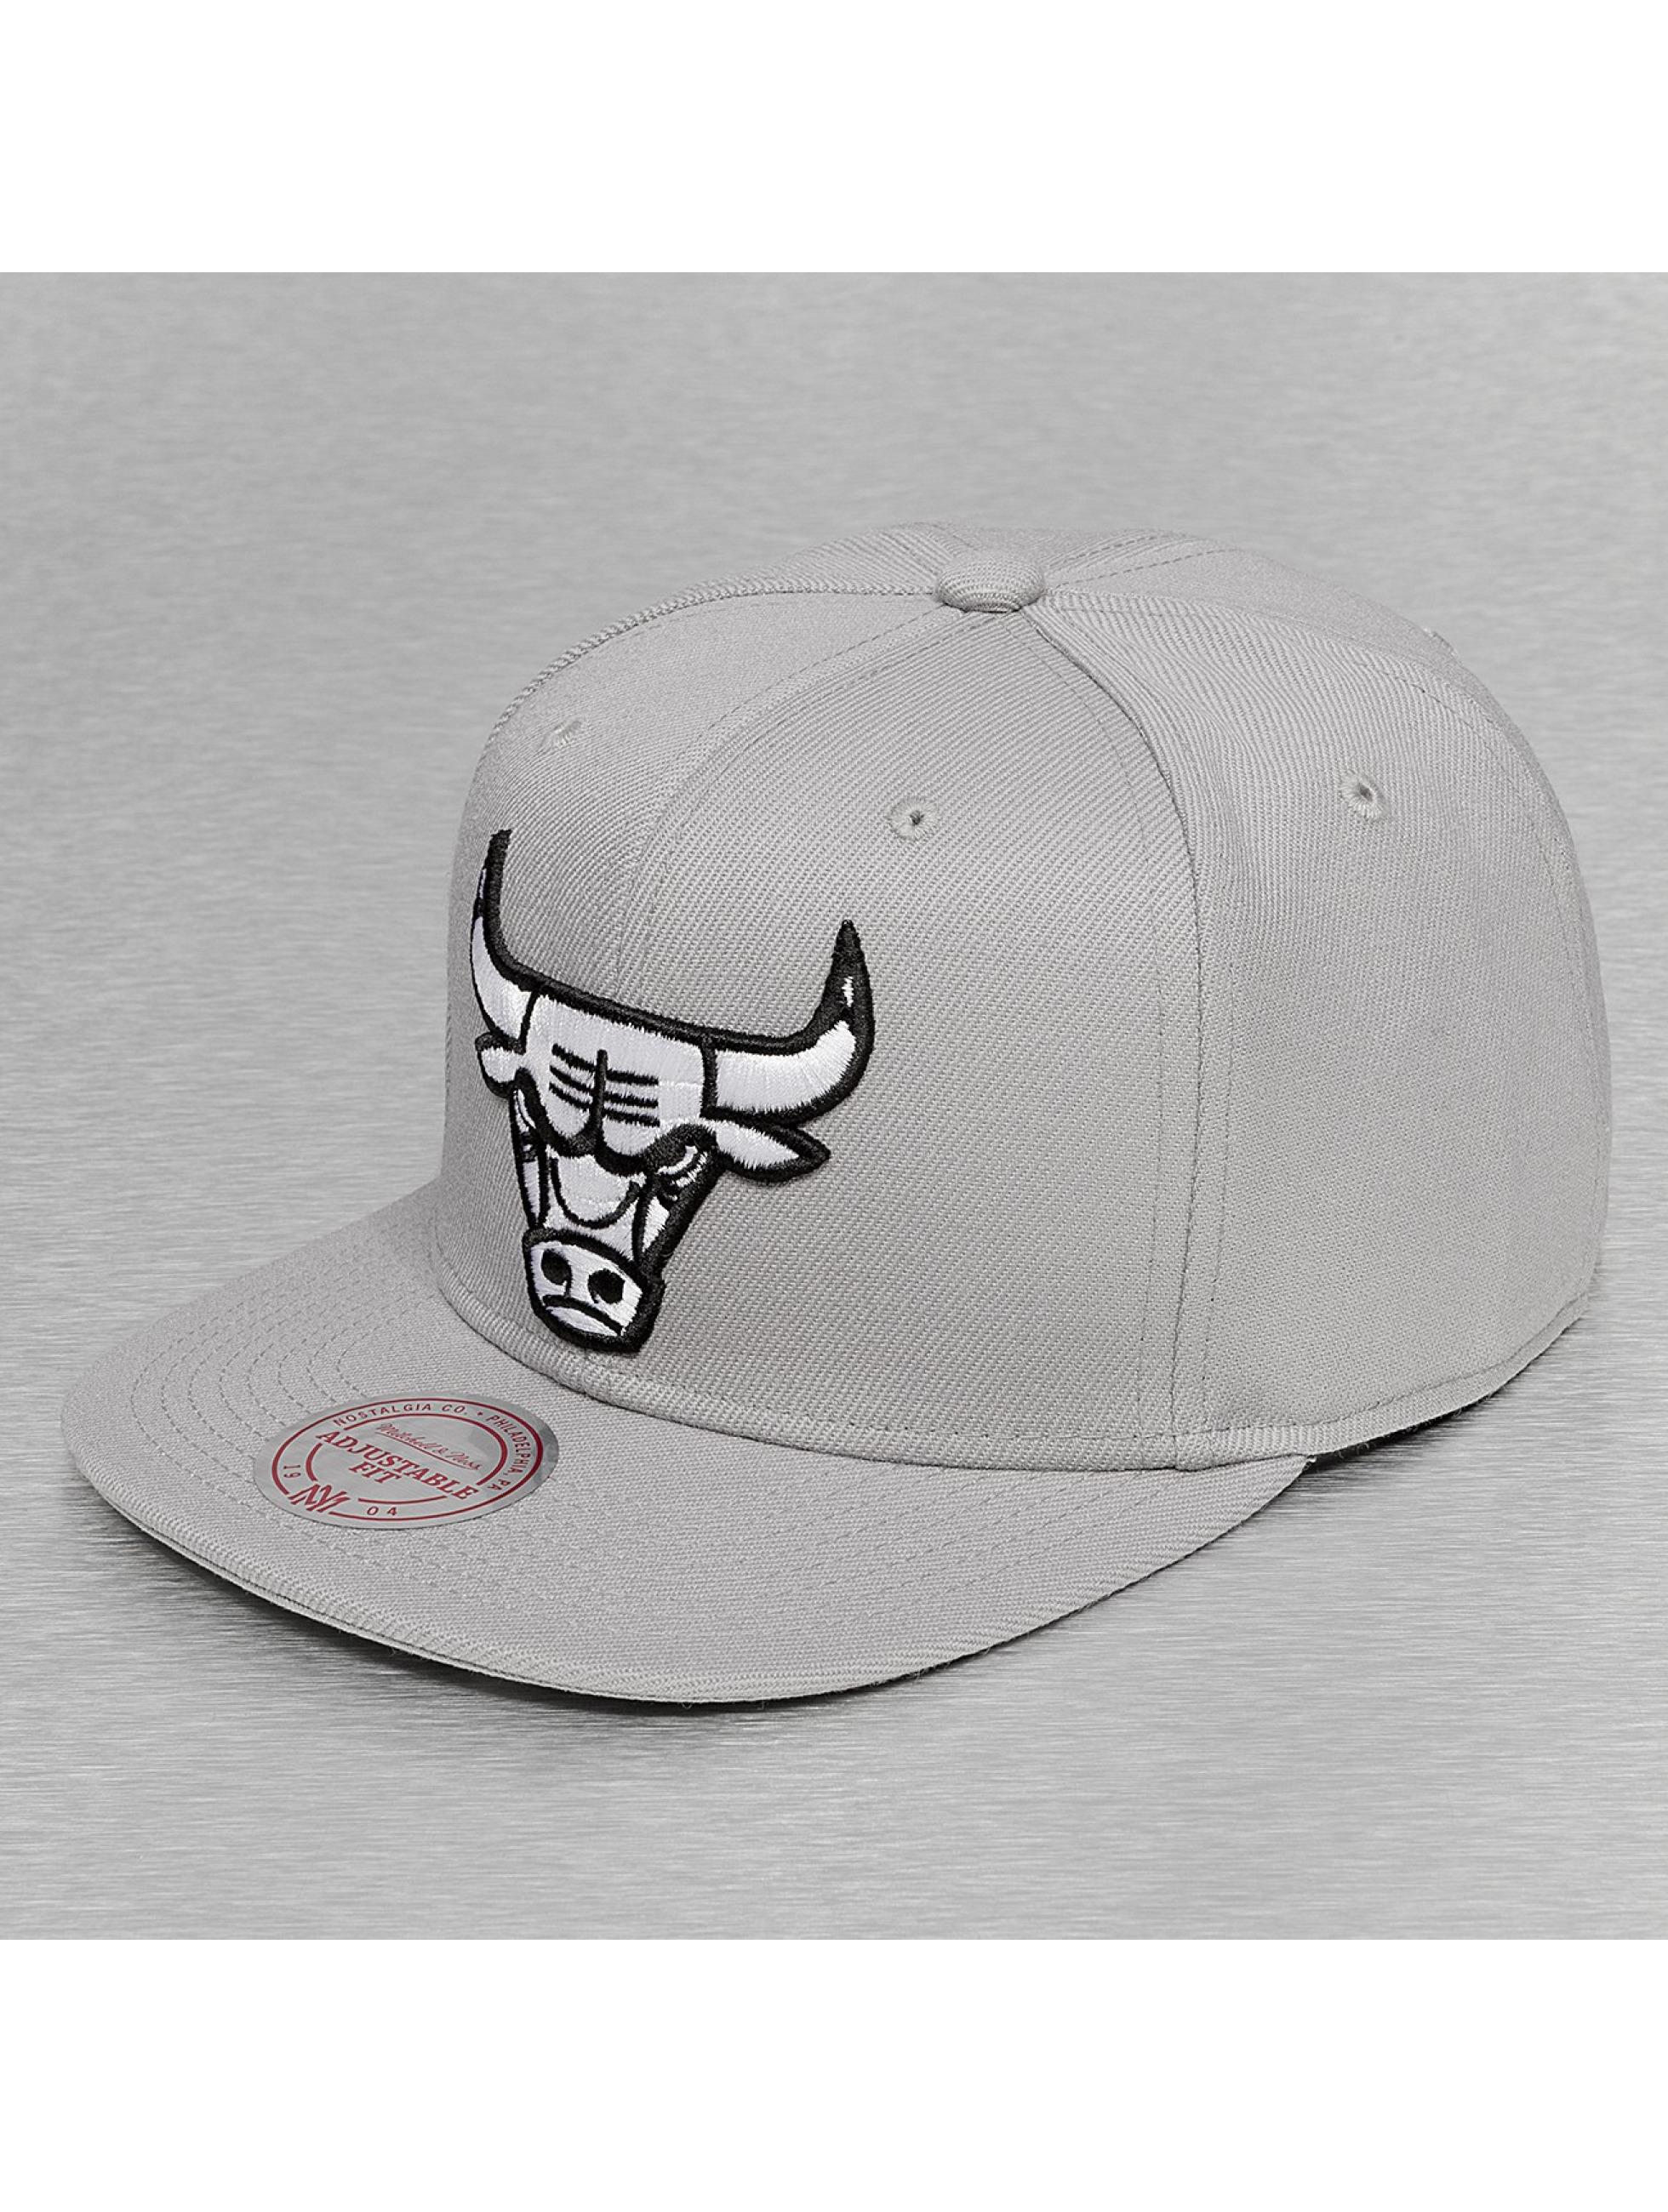 Mitchell & Ness snapback cap Black & White Logo Series grijs